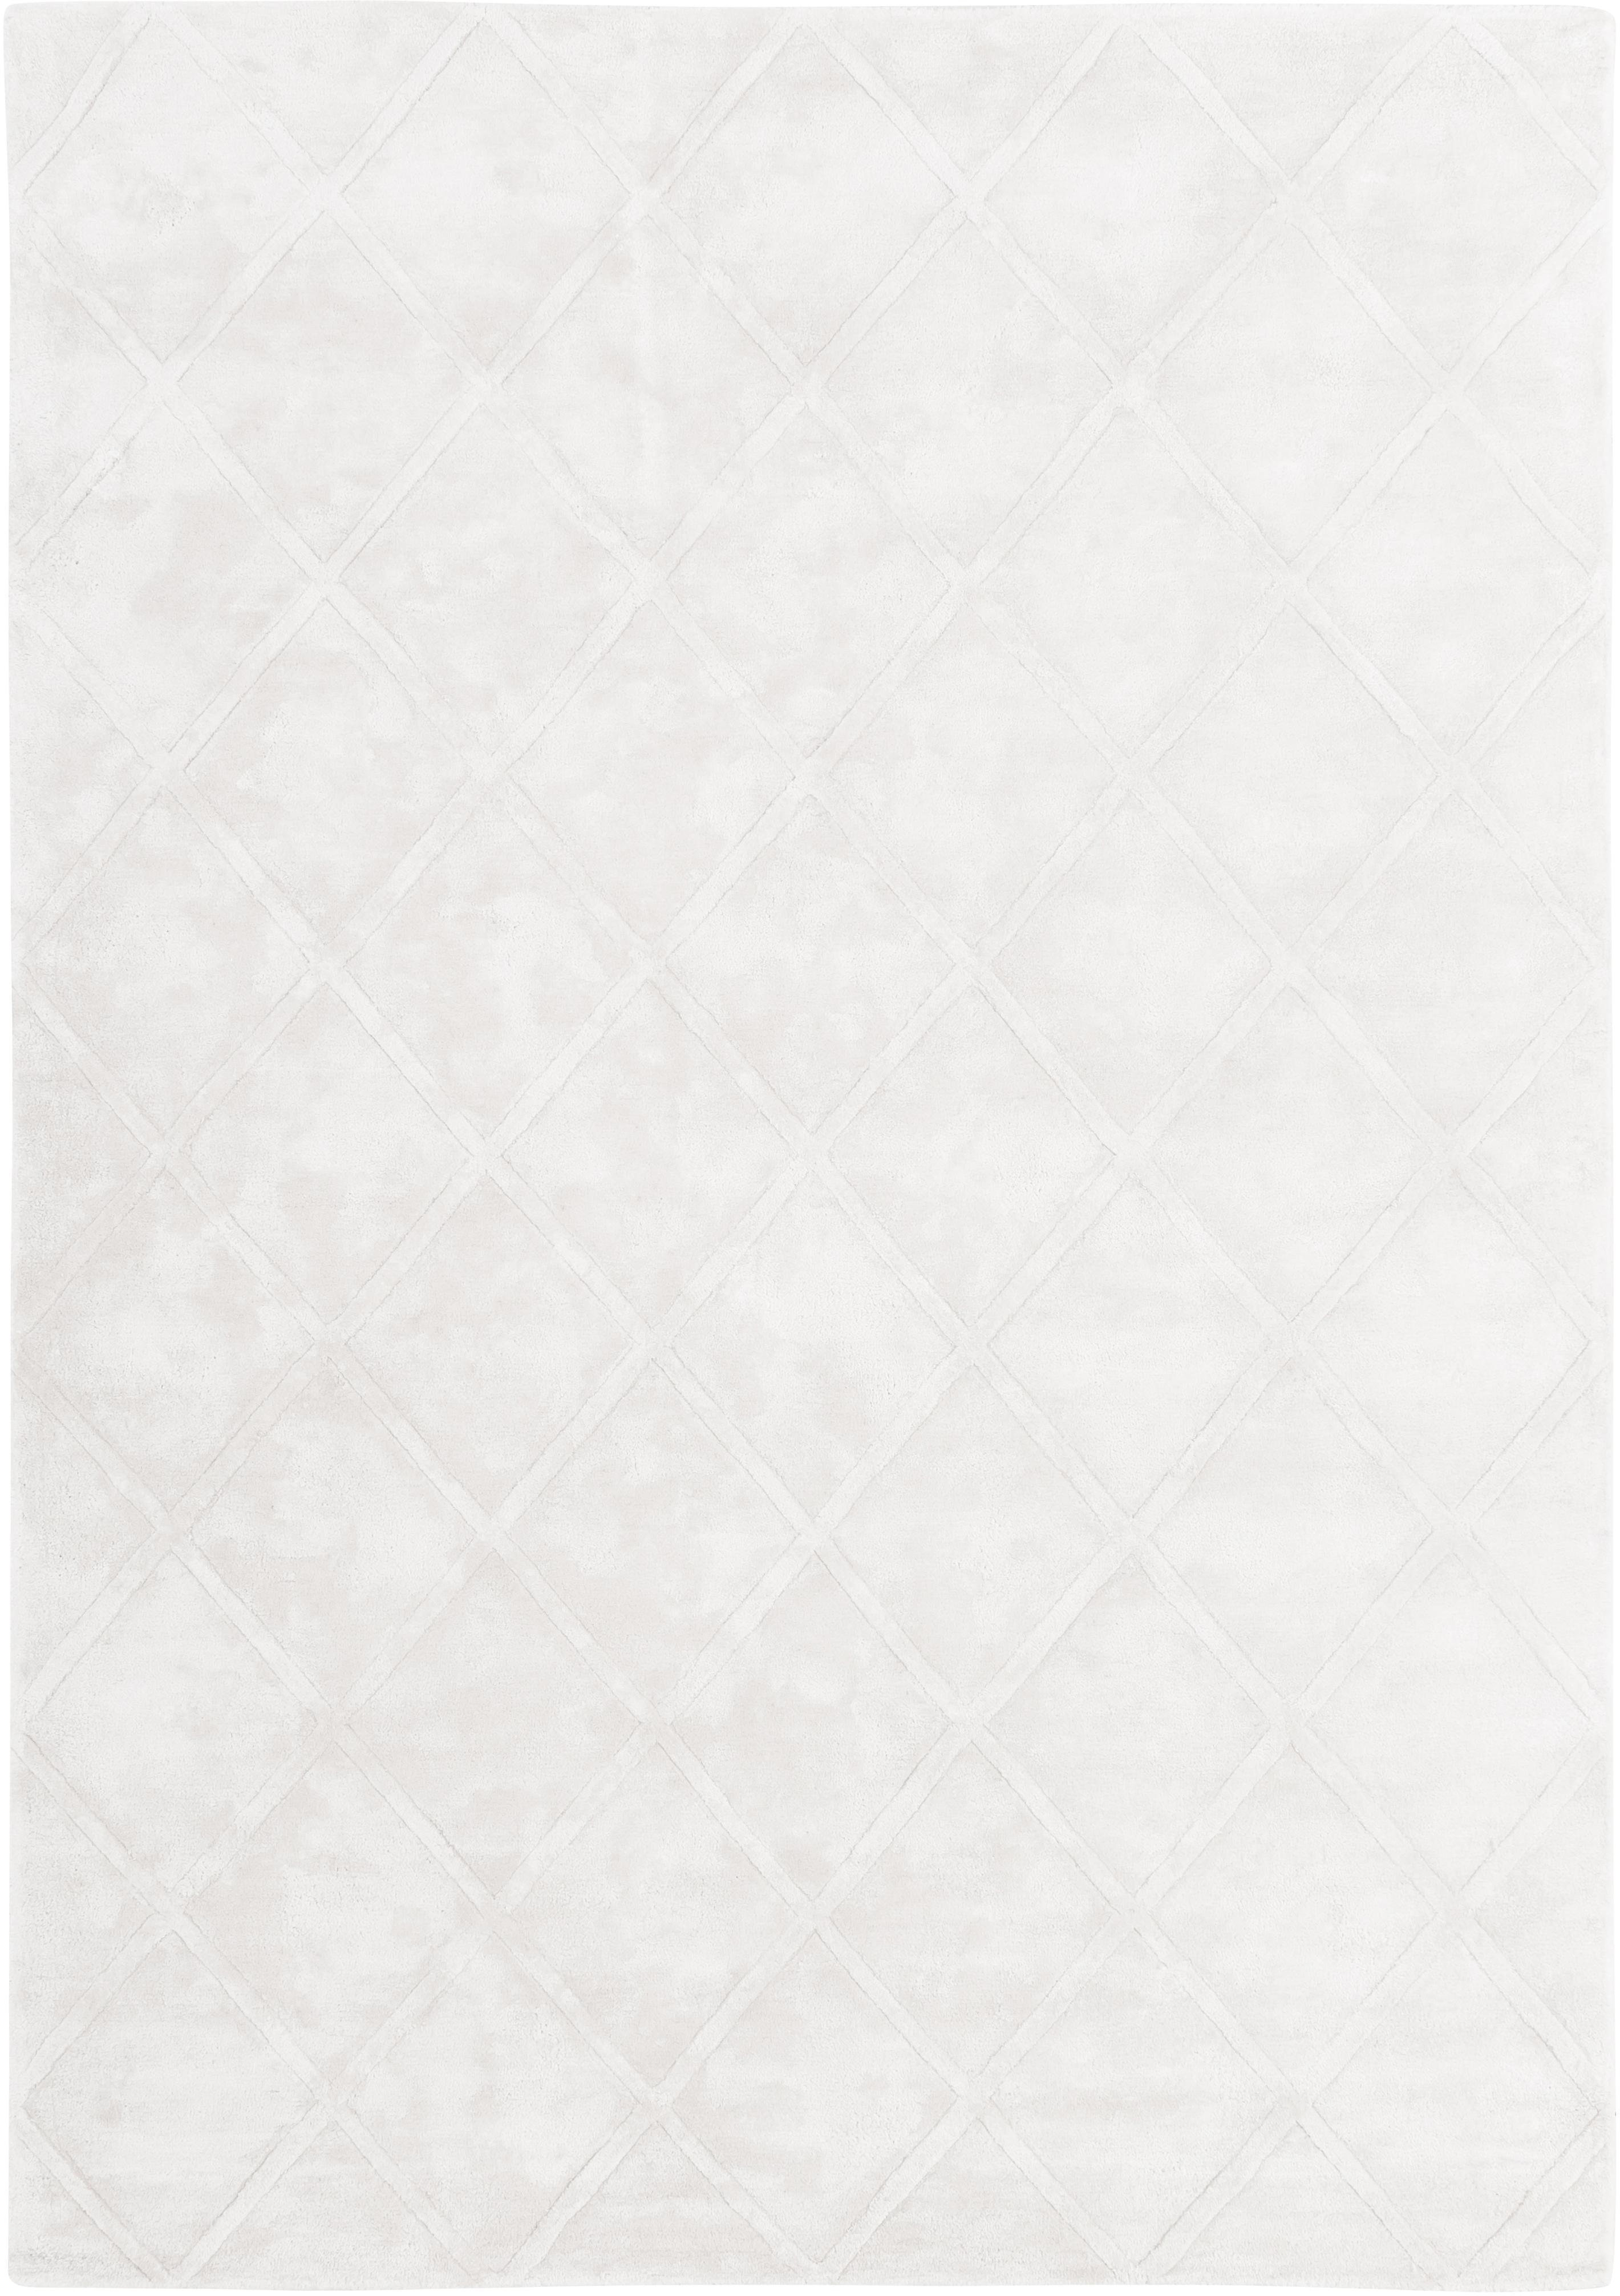 Alfombra artesanal de viscosa Madeleine, Parte superior: 100%viscosa, Reverso: 100%algodón, Crema, An 120 x L 180  cm(Tamaño S)